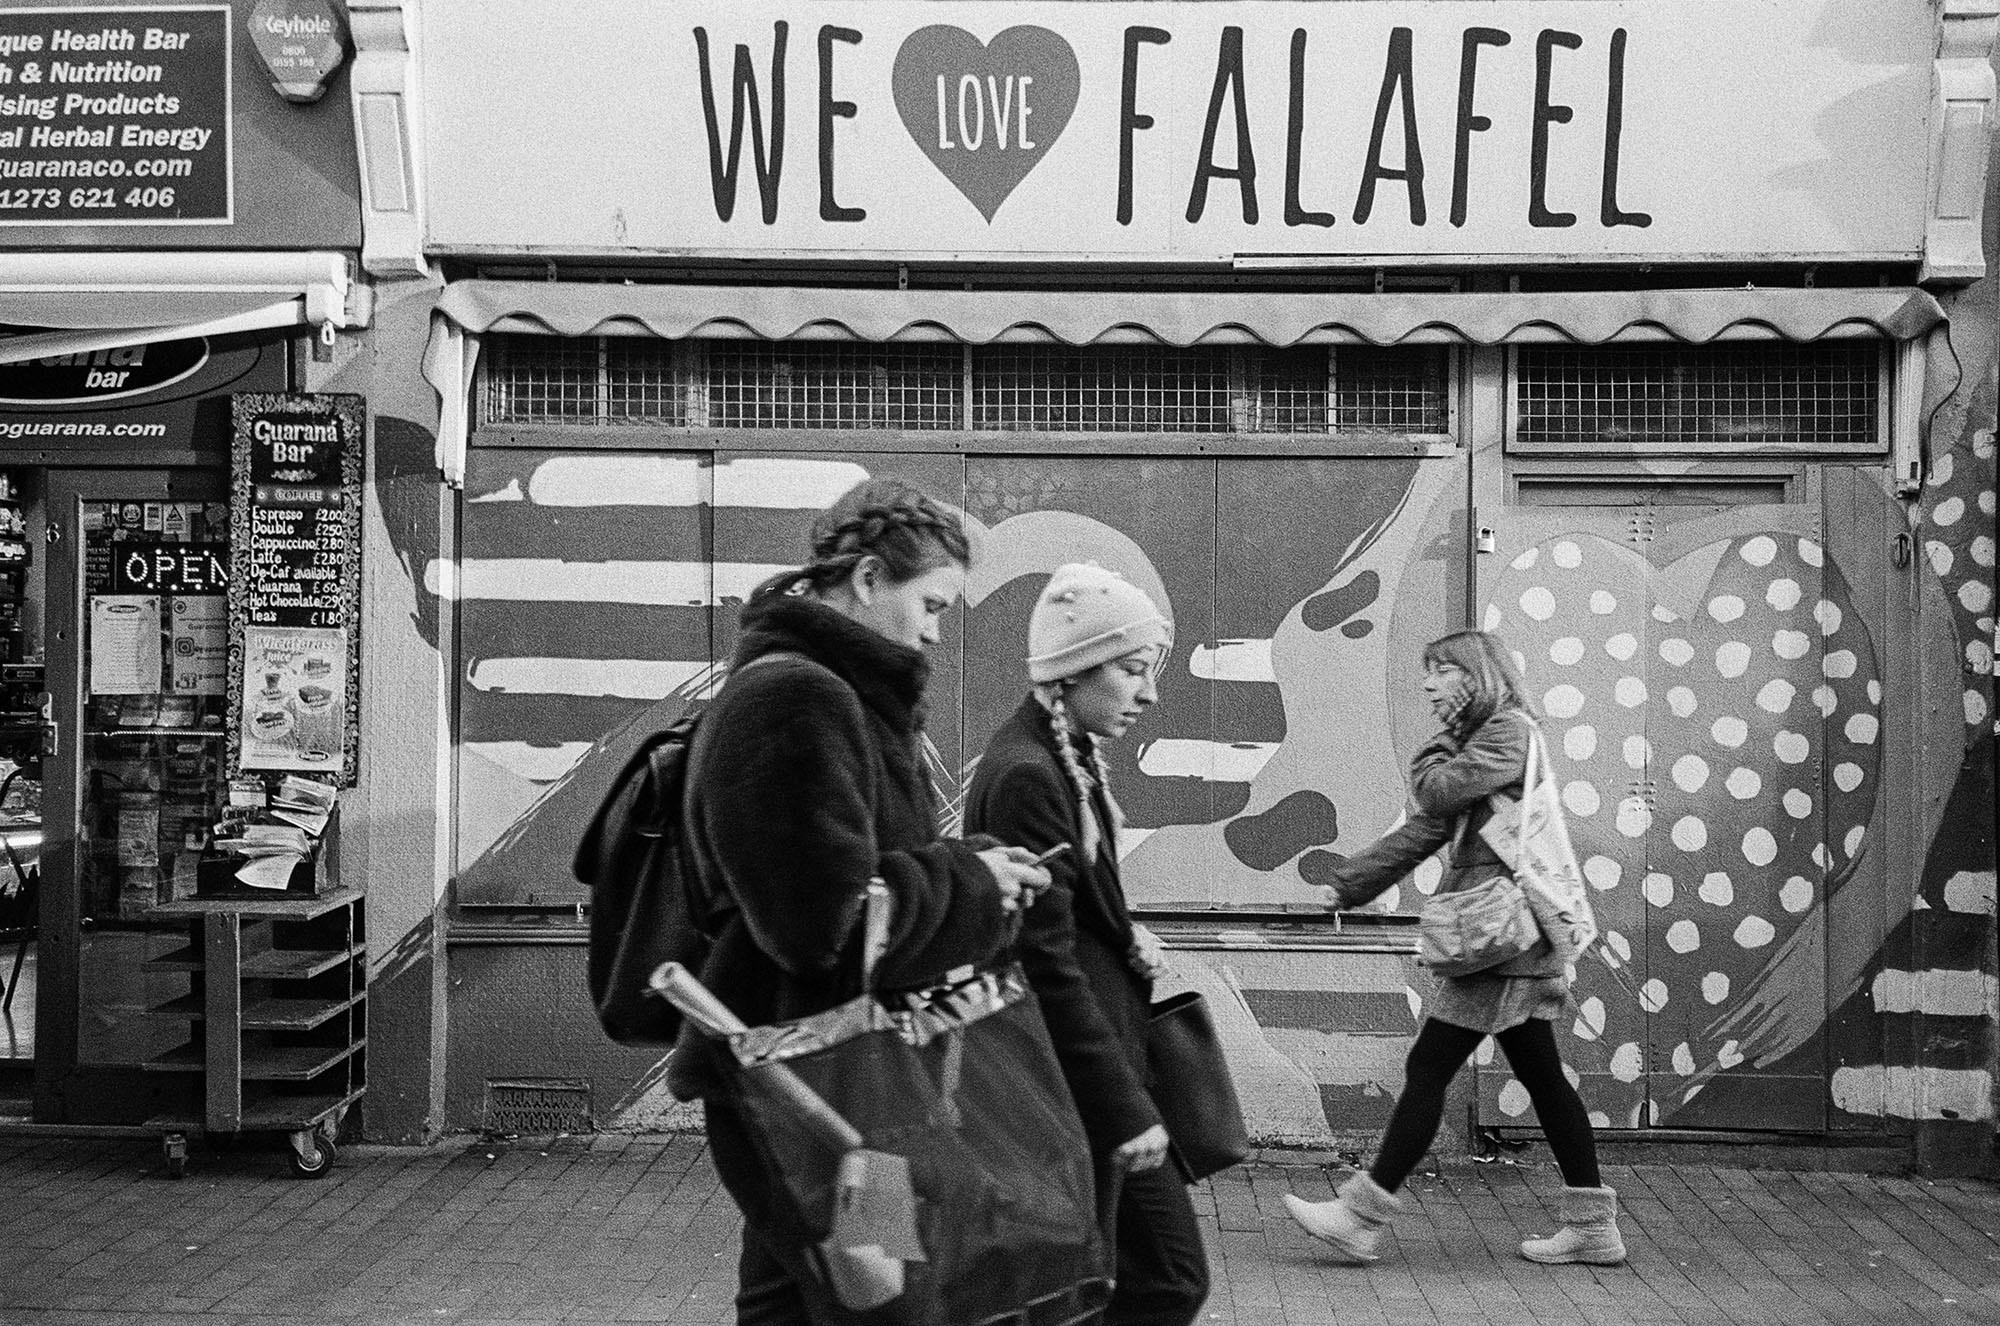 Analogue stories film photos documentary